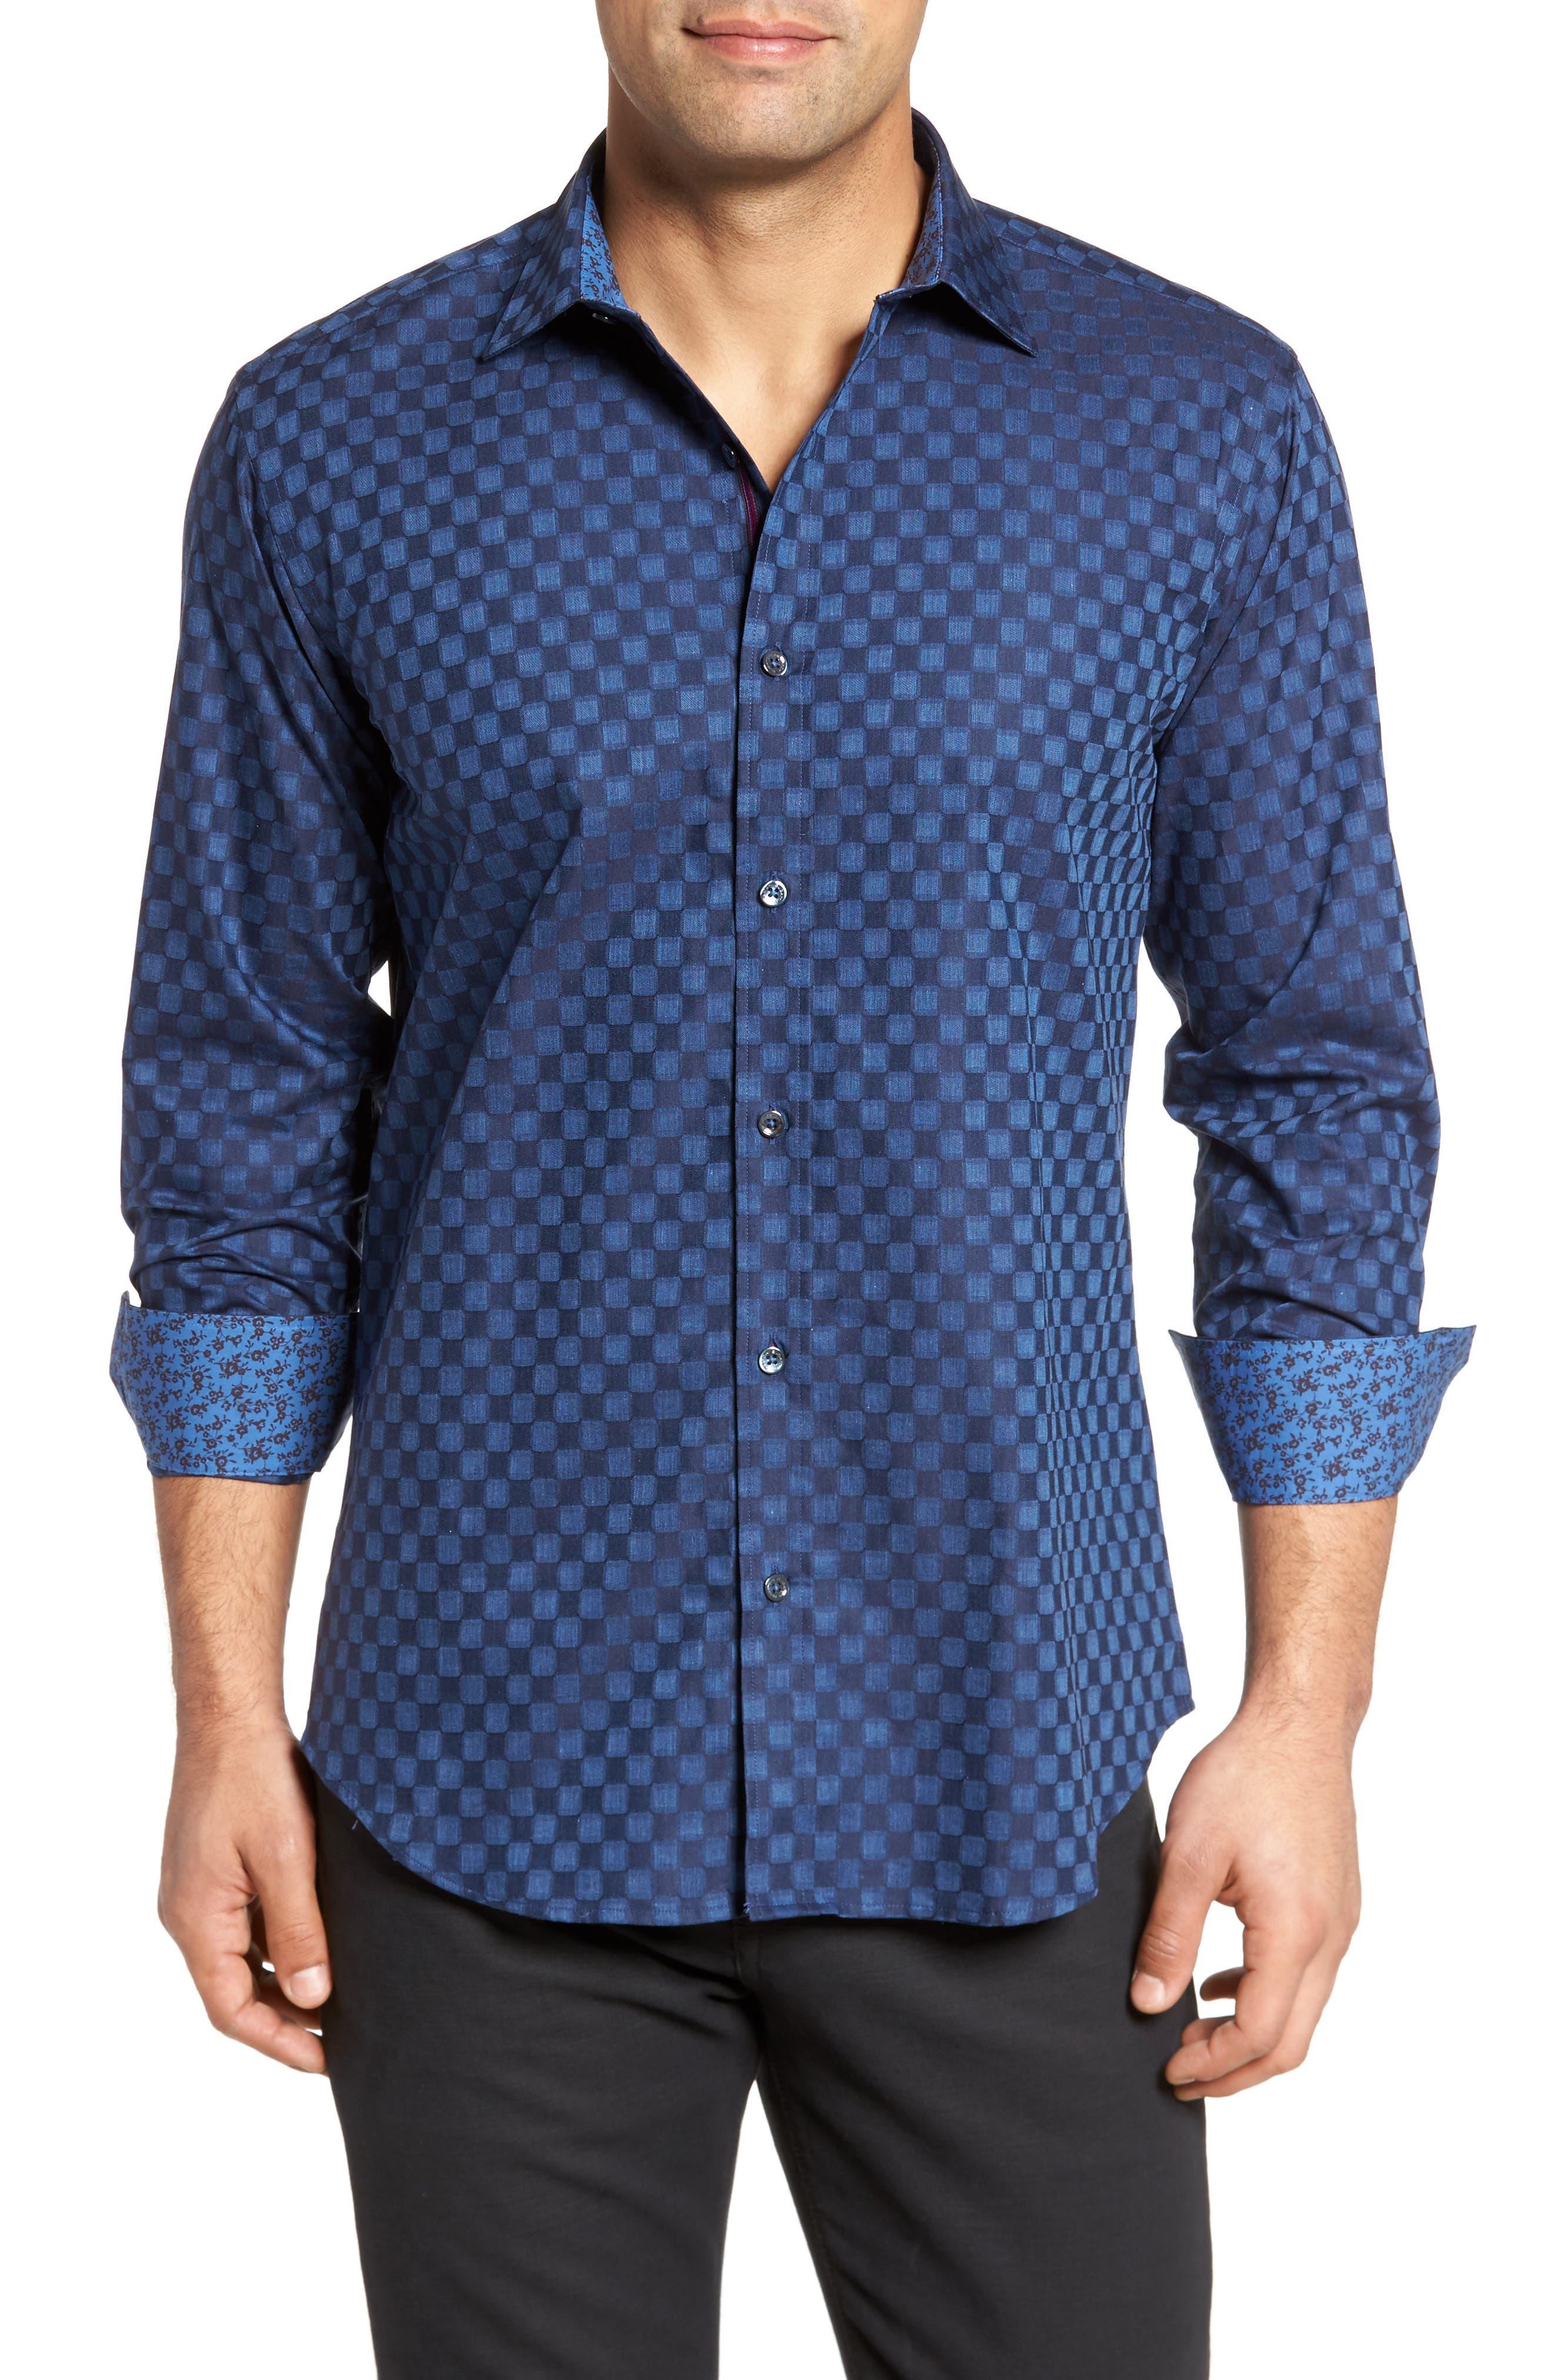 Main Image - Bugatchi Slim Fit Square Jacquard Sport Shirt